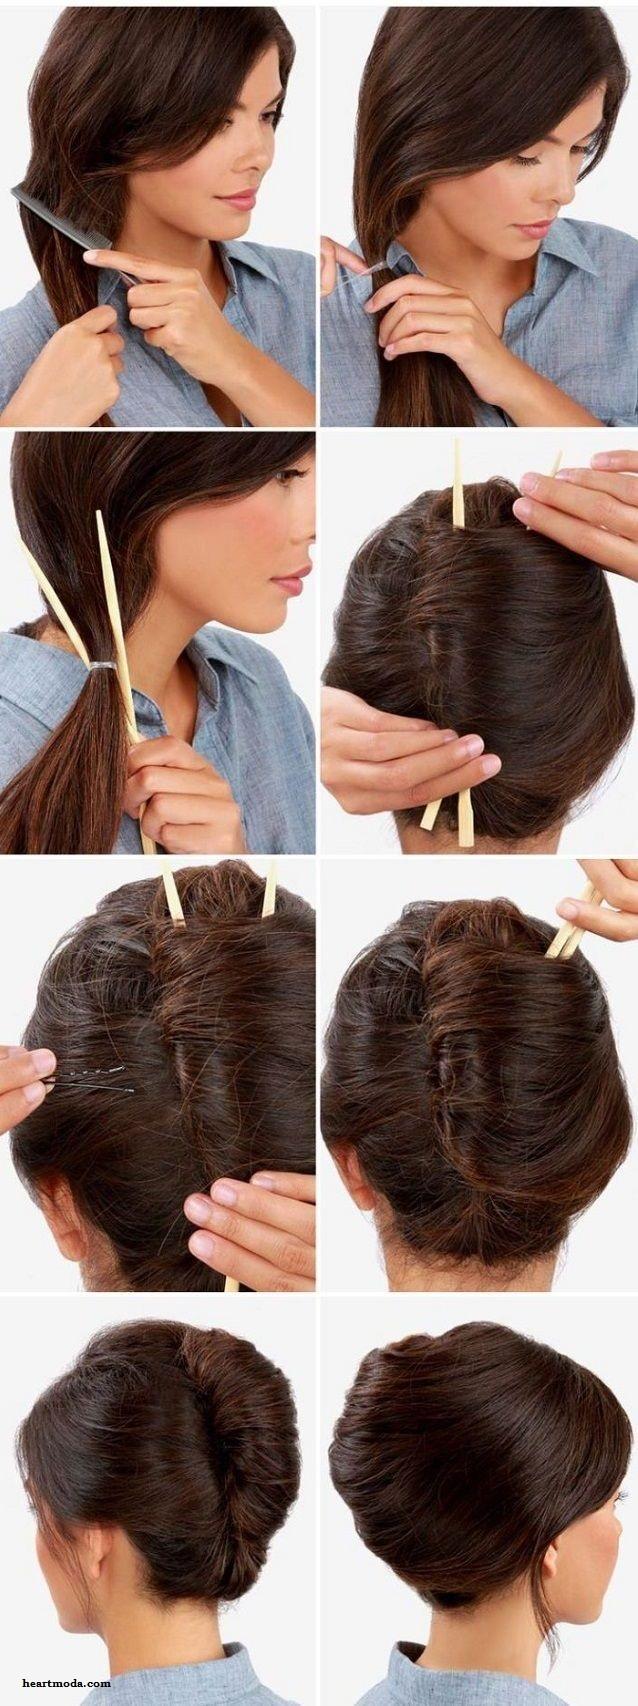 coiffure-simple-facile-21